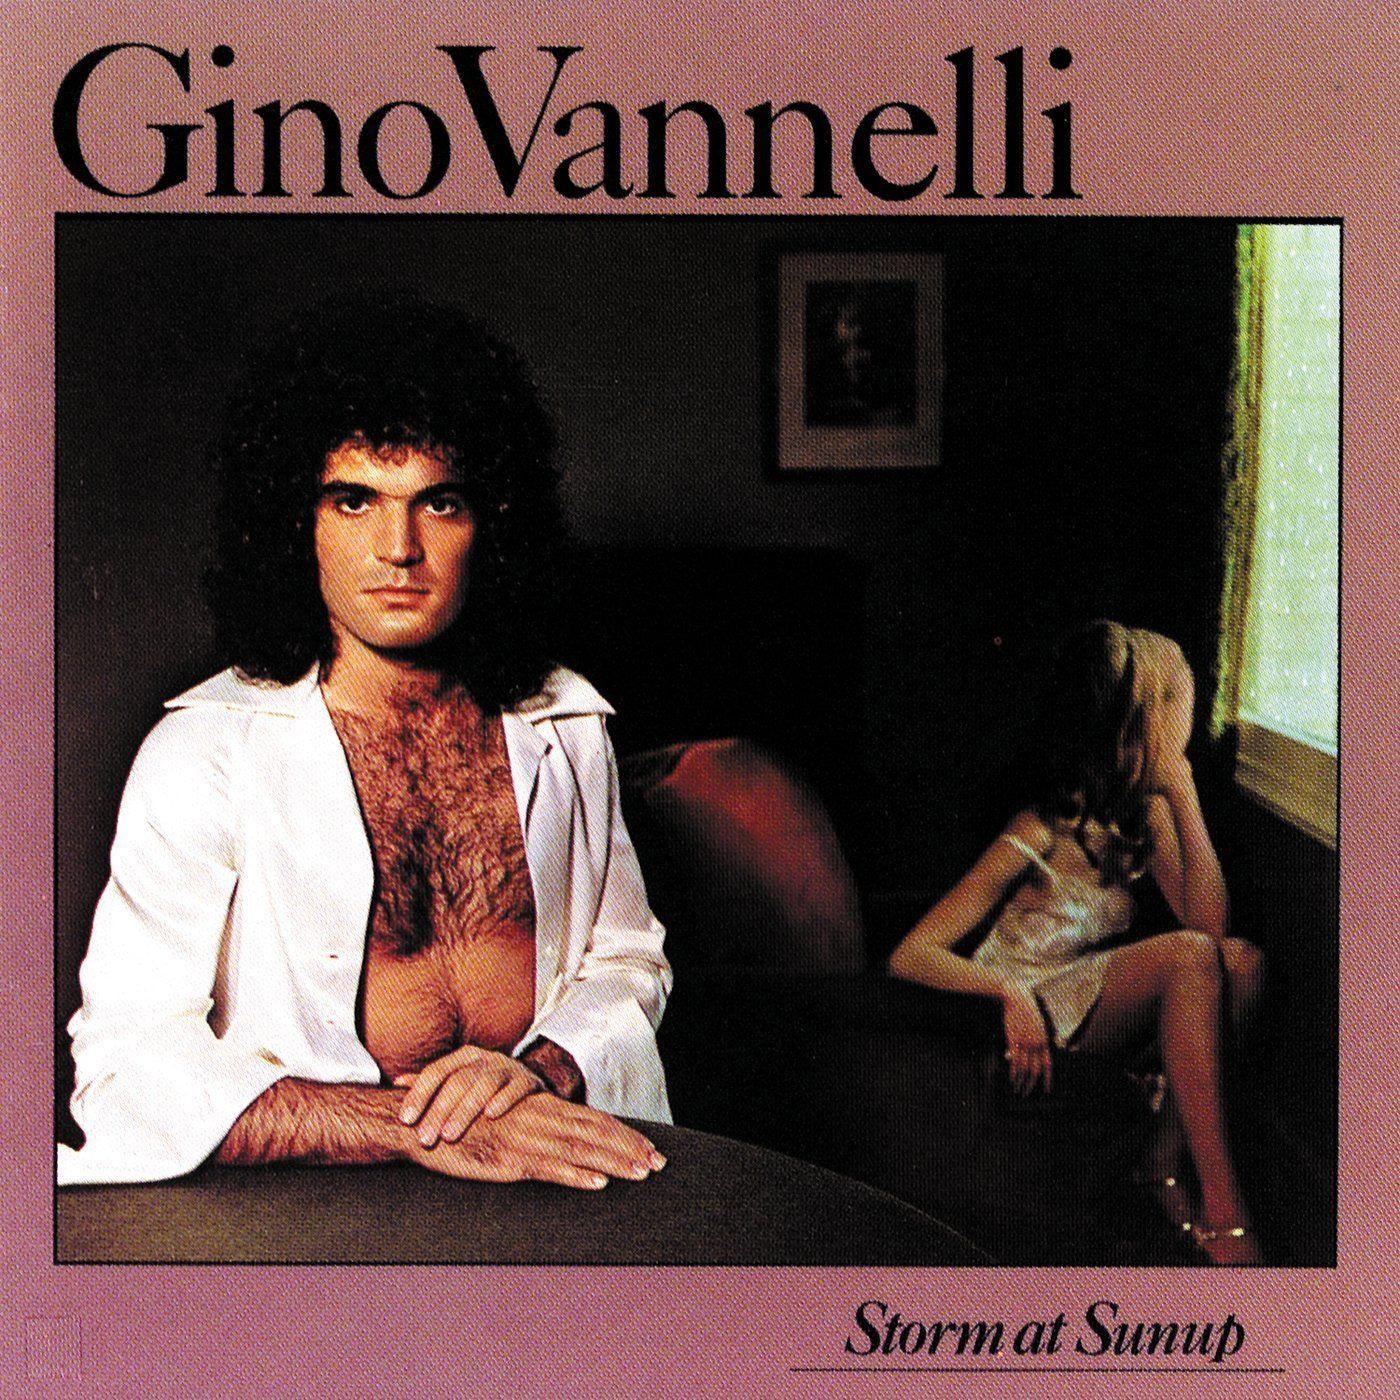 Gino vannellis 1975 release storm at sunup rock album